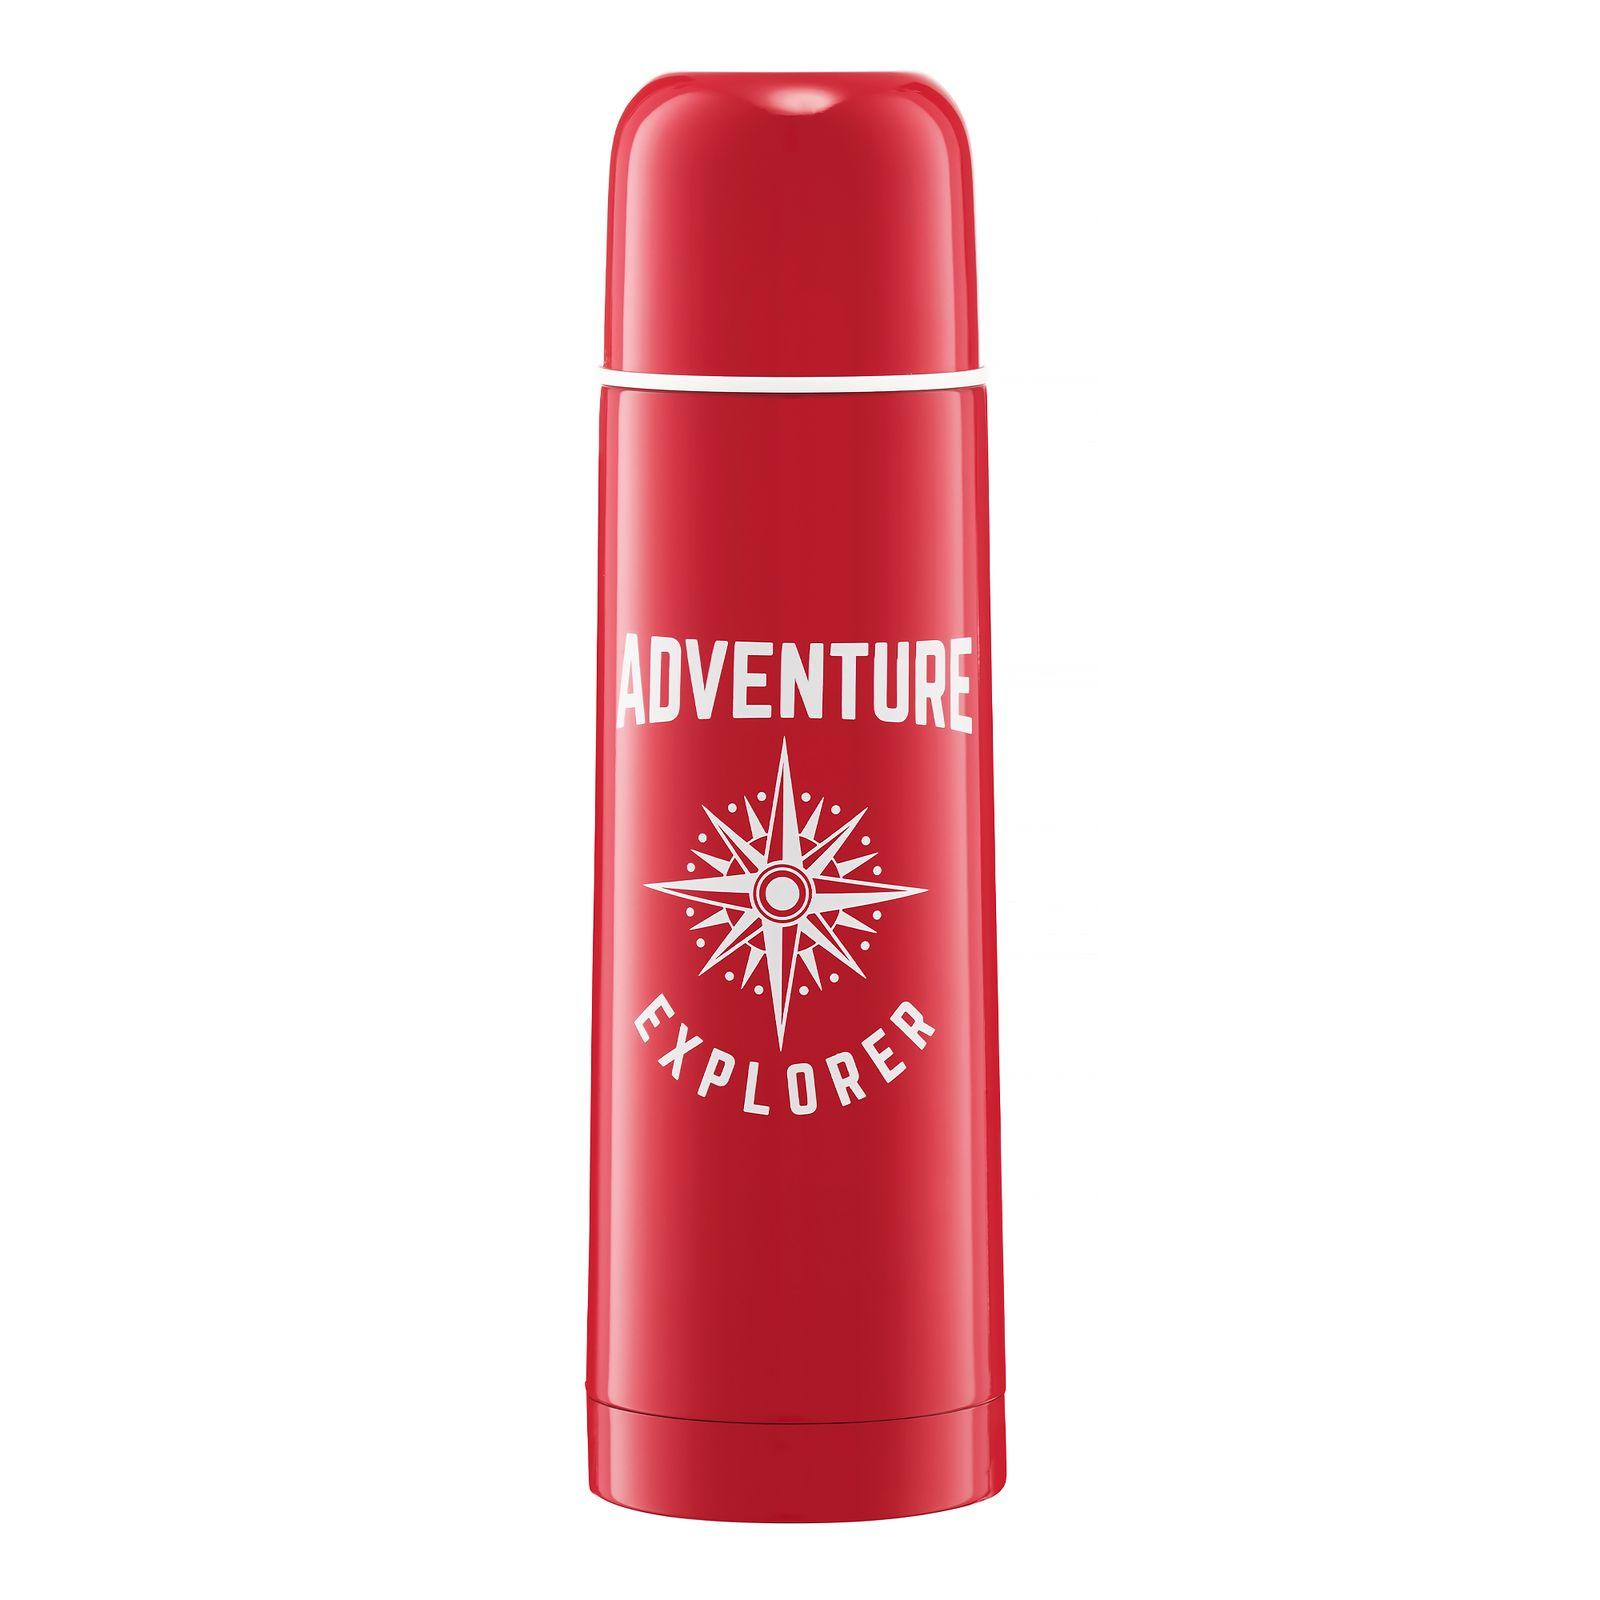 Thermos Adventure Explorer 500 ml AMBITION